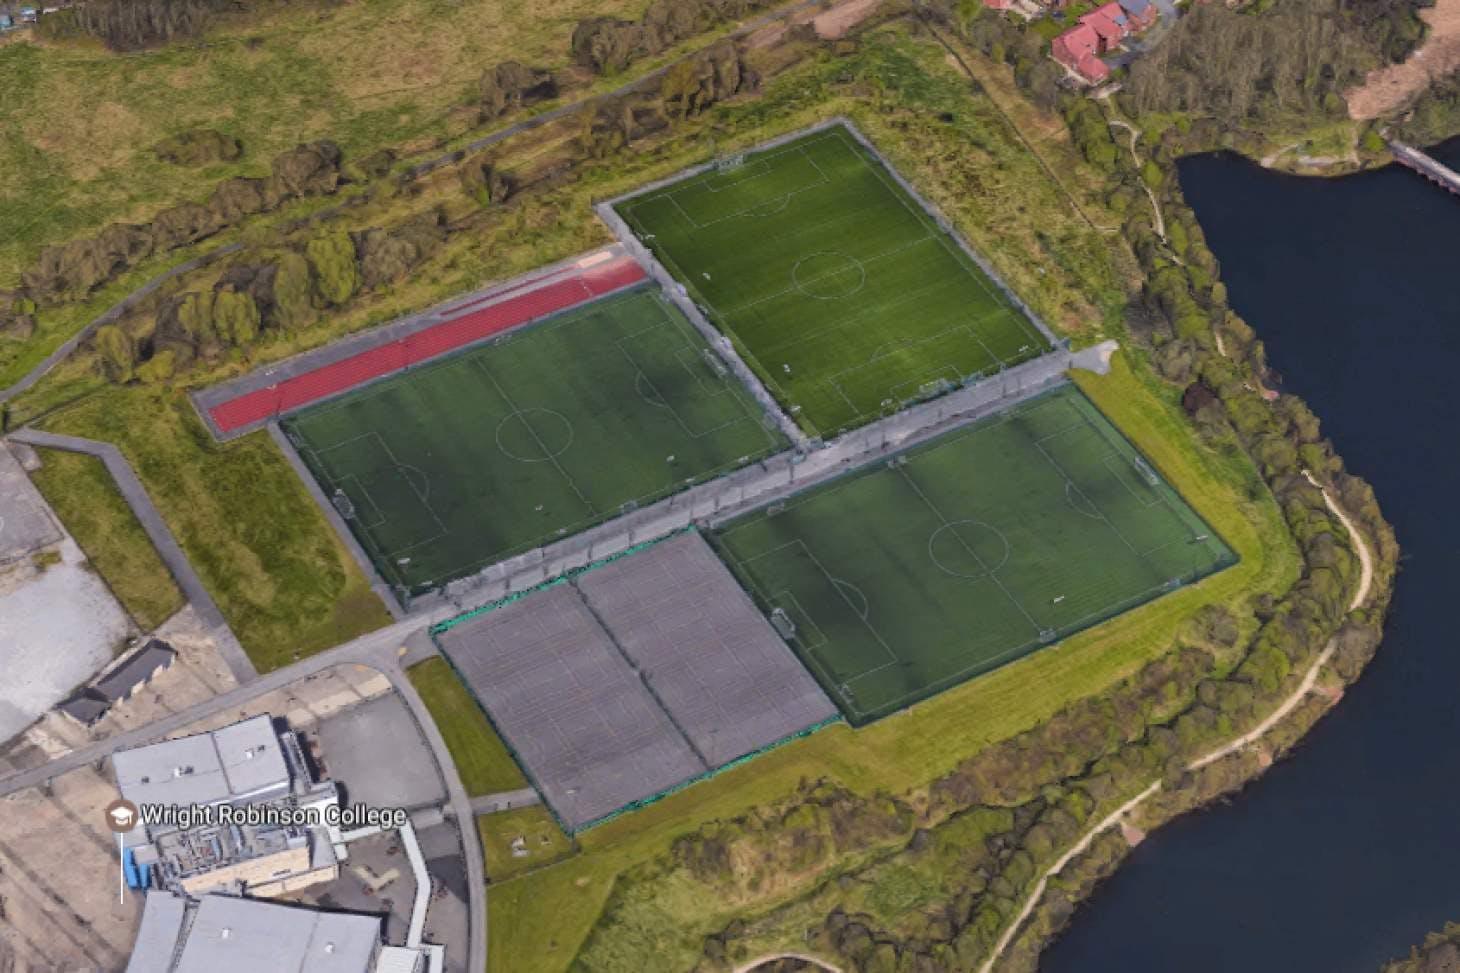 Wright Robinson Leisure Outdoor | Hard (macadam) tennis court